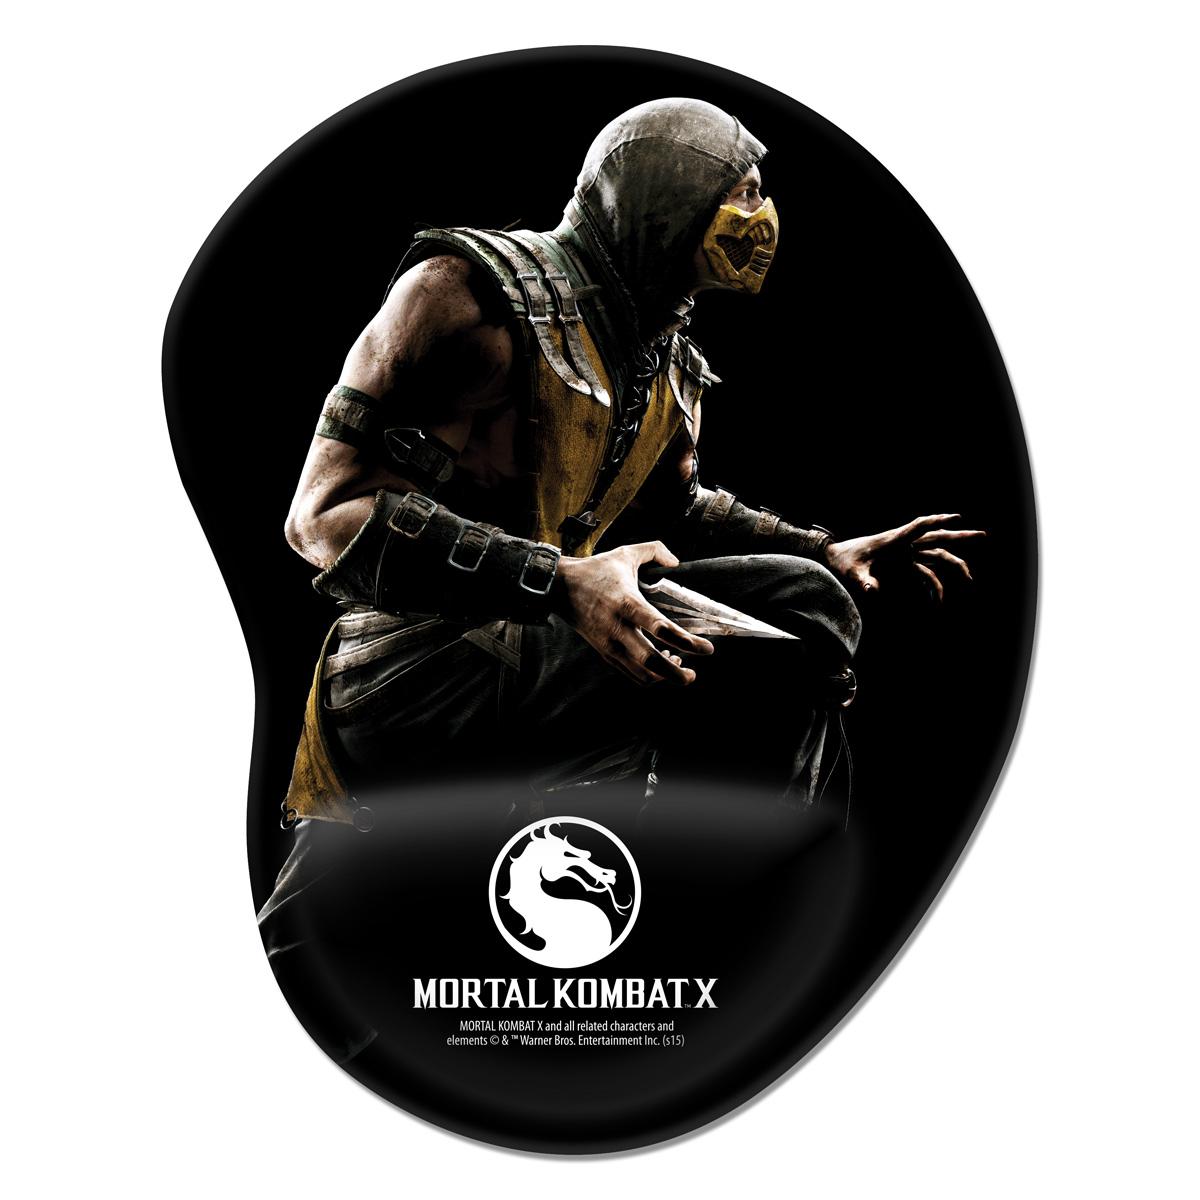 Mousepad Mortal Kombat X Capa